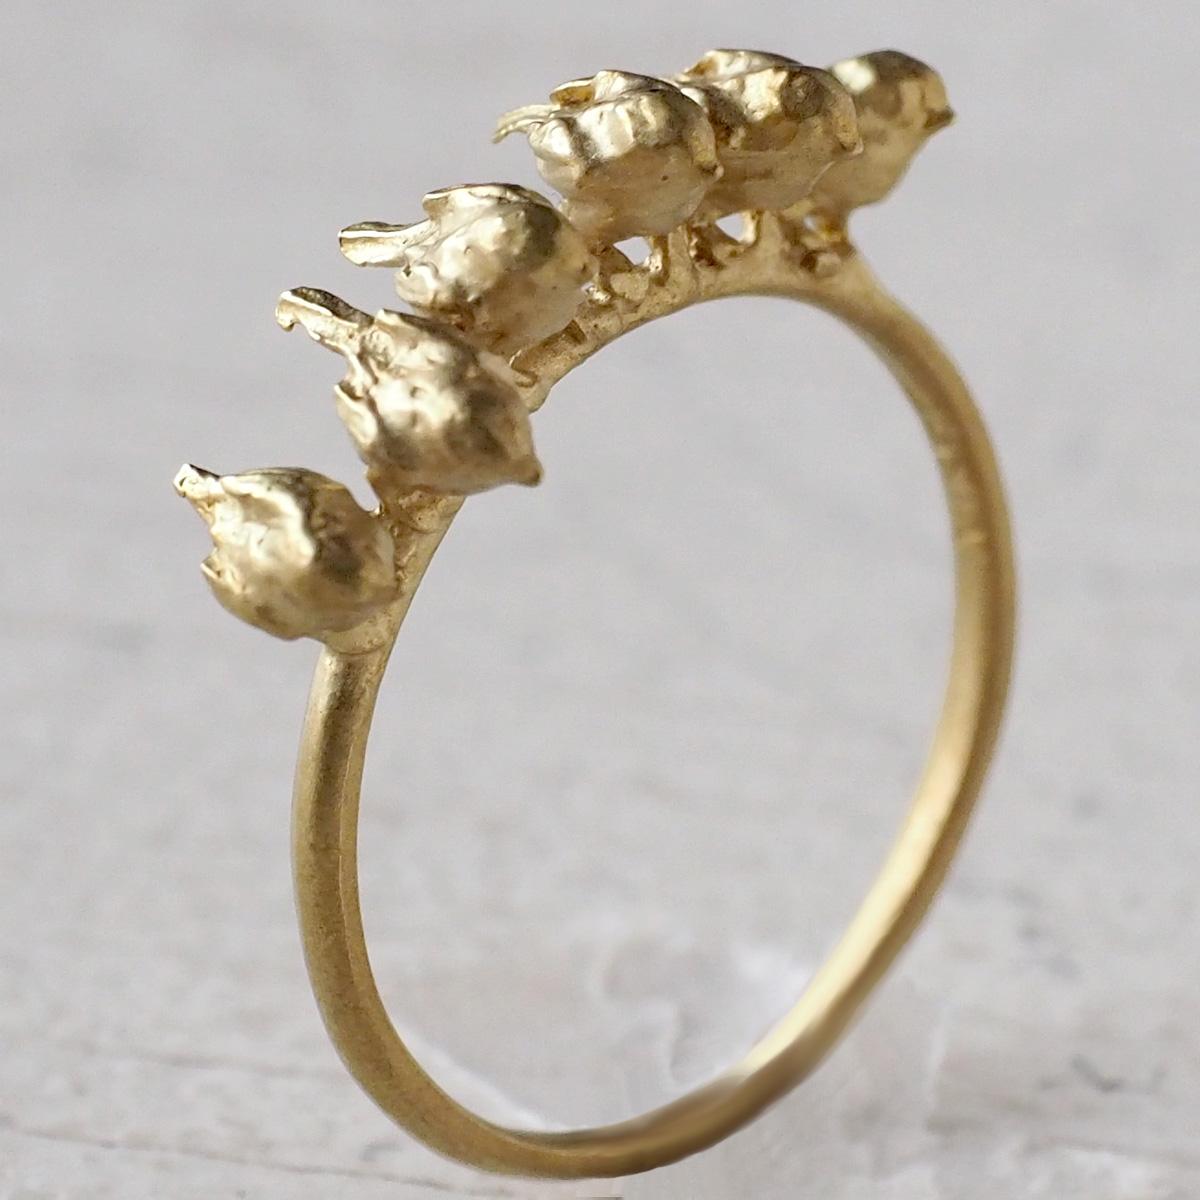 DECOvienya(デコヴィーニャ)手作りアクセサリー エナガいっぱいリング ゴールド [DE-151G]